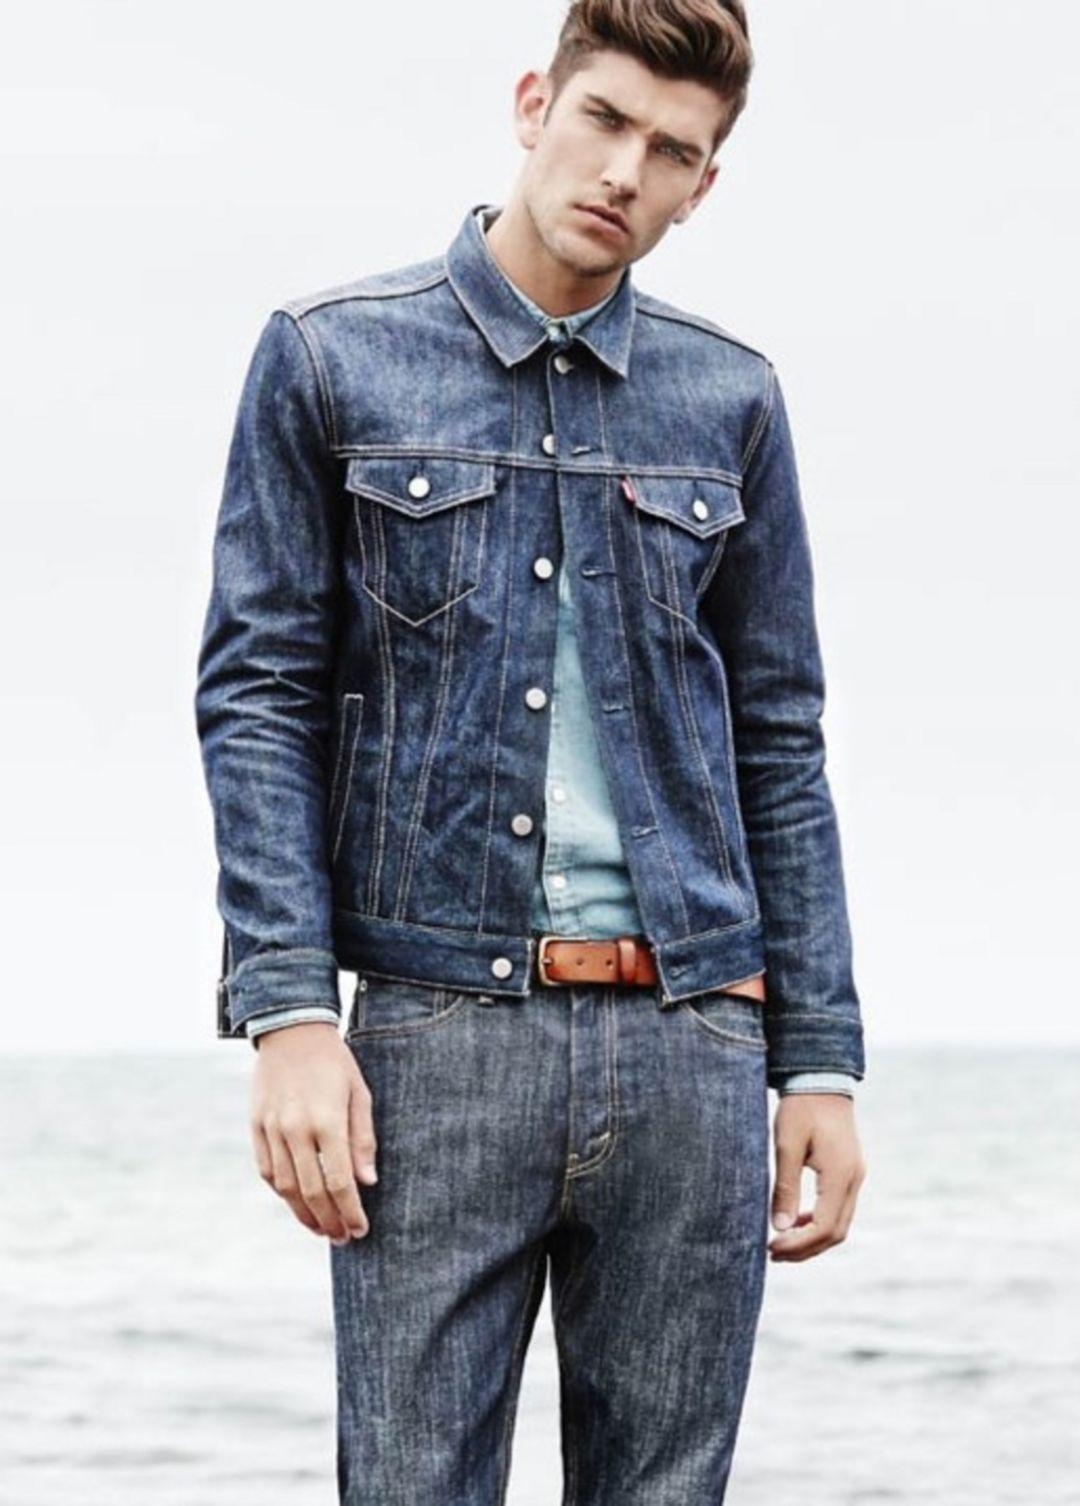 45 Awesome Jeans Jackets Ideas For Men Look Cooler Fashions Nowadays Denim Jacket Men Mens Fashion Jeans Jackets Men Street [ 1506 x 1080 Pixel ]